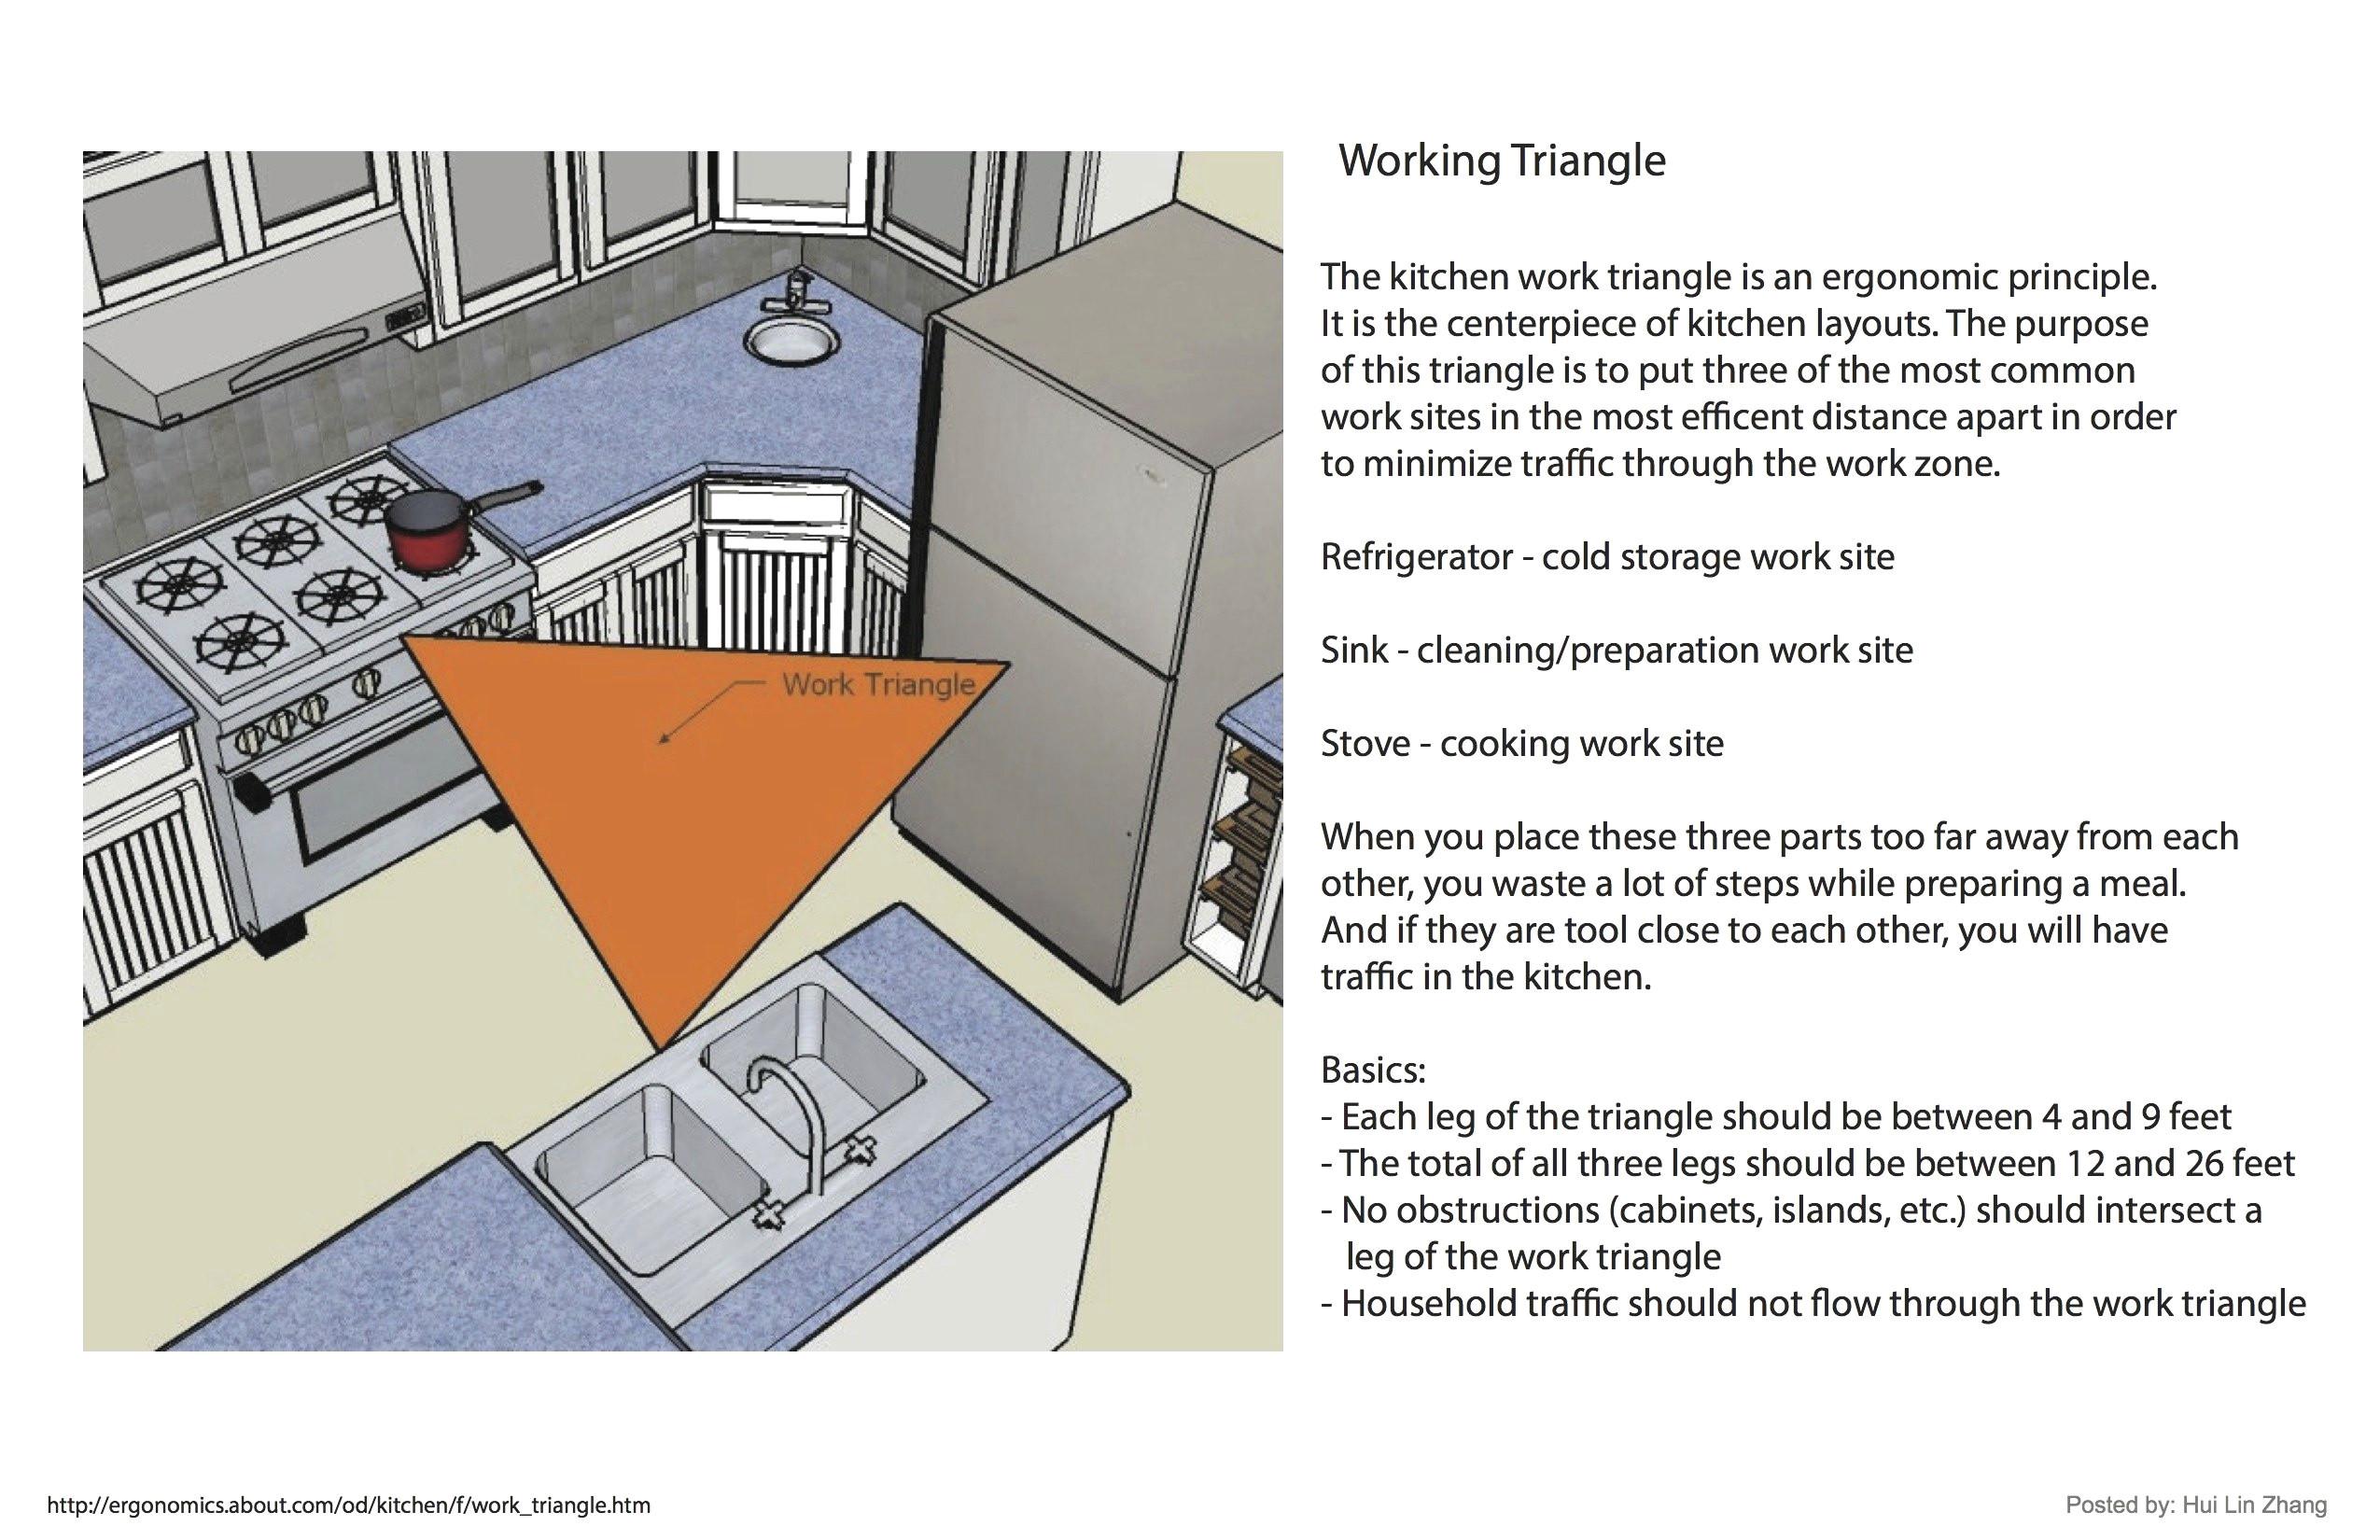 free 3d kitchen design tool lovely kitchen design 3d software fresh 3d kitchen designer free download